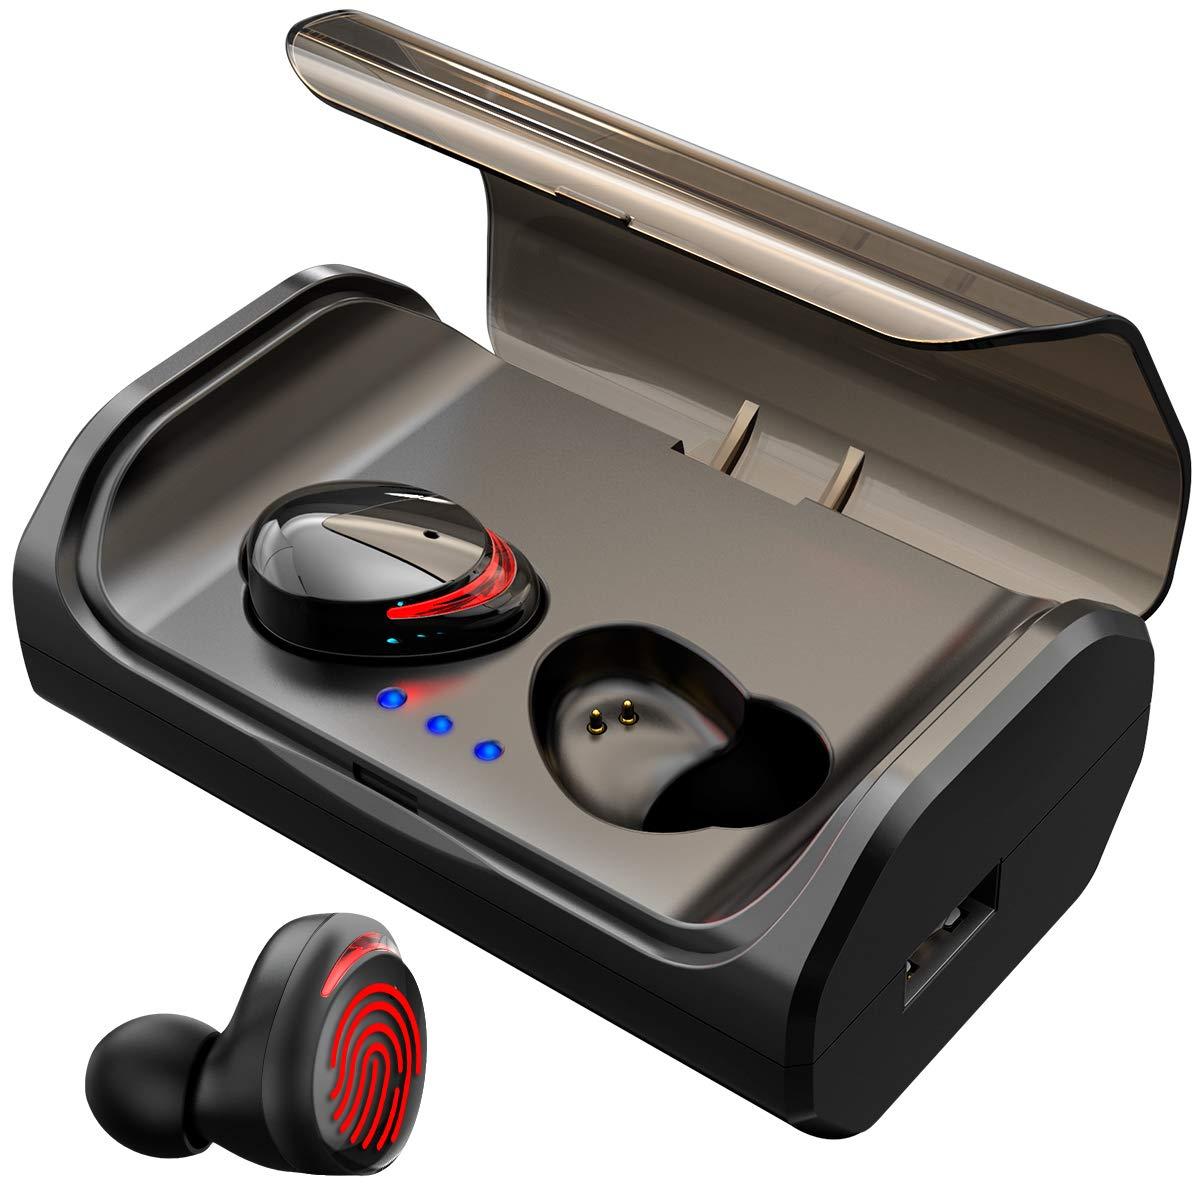 98764be1292 [ Nuovo Auricolari Bluetooth 5.0 ] HolyHigh senza Fili Sport In ear Cuffie  Bluetooth IPX6 Wireless